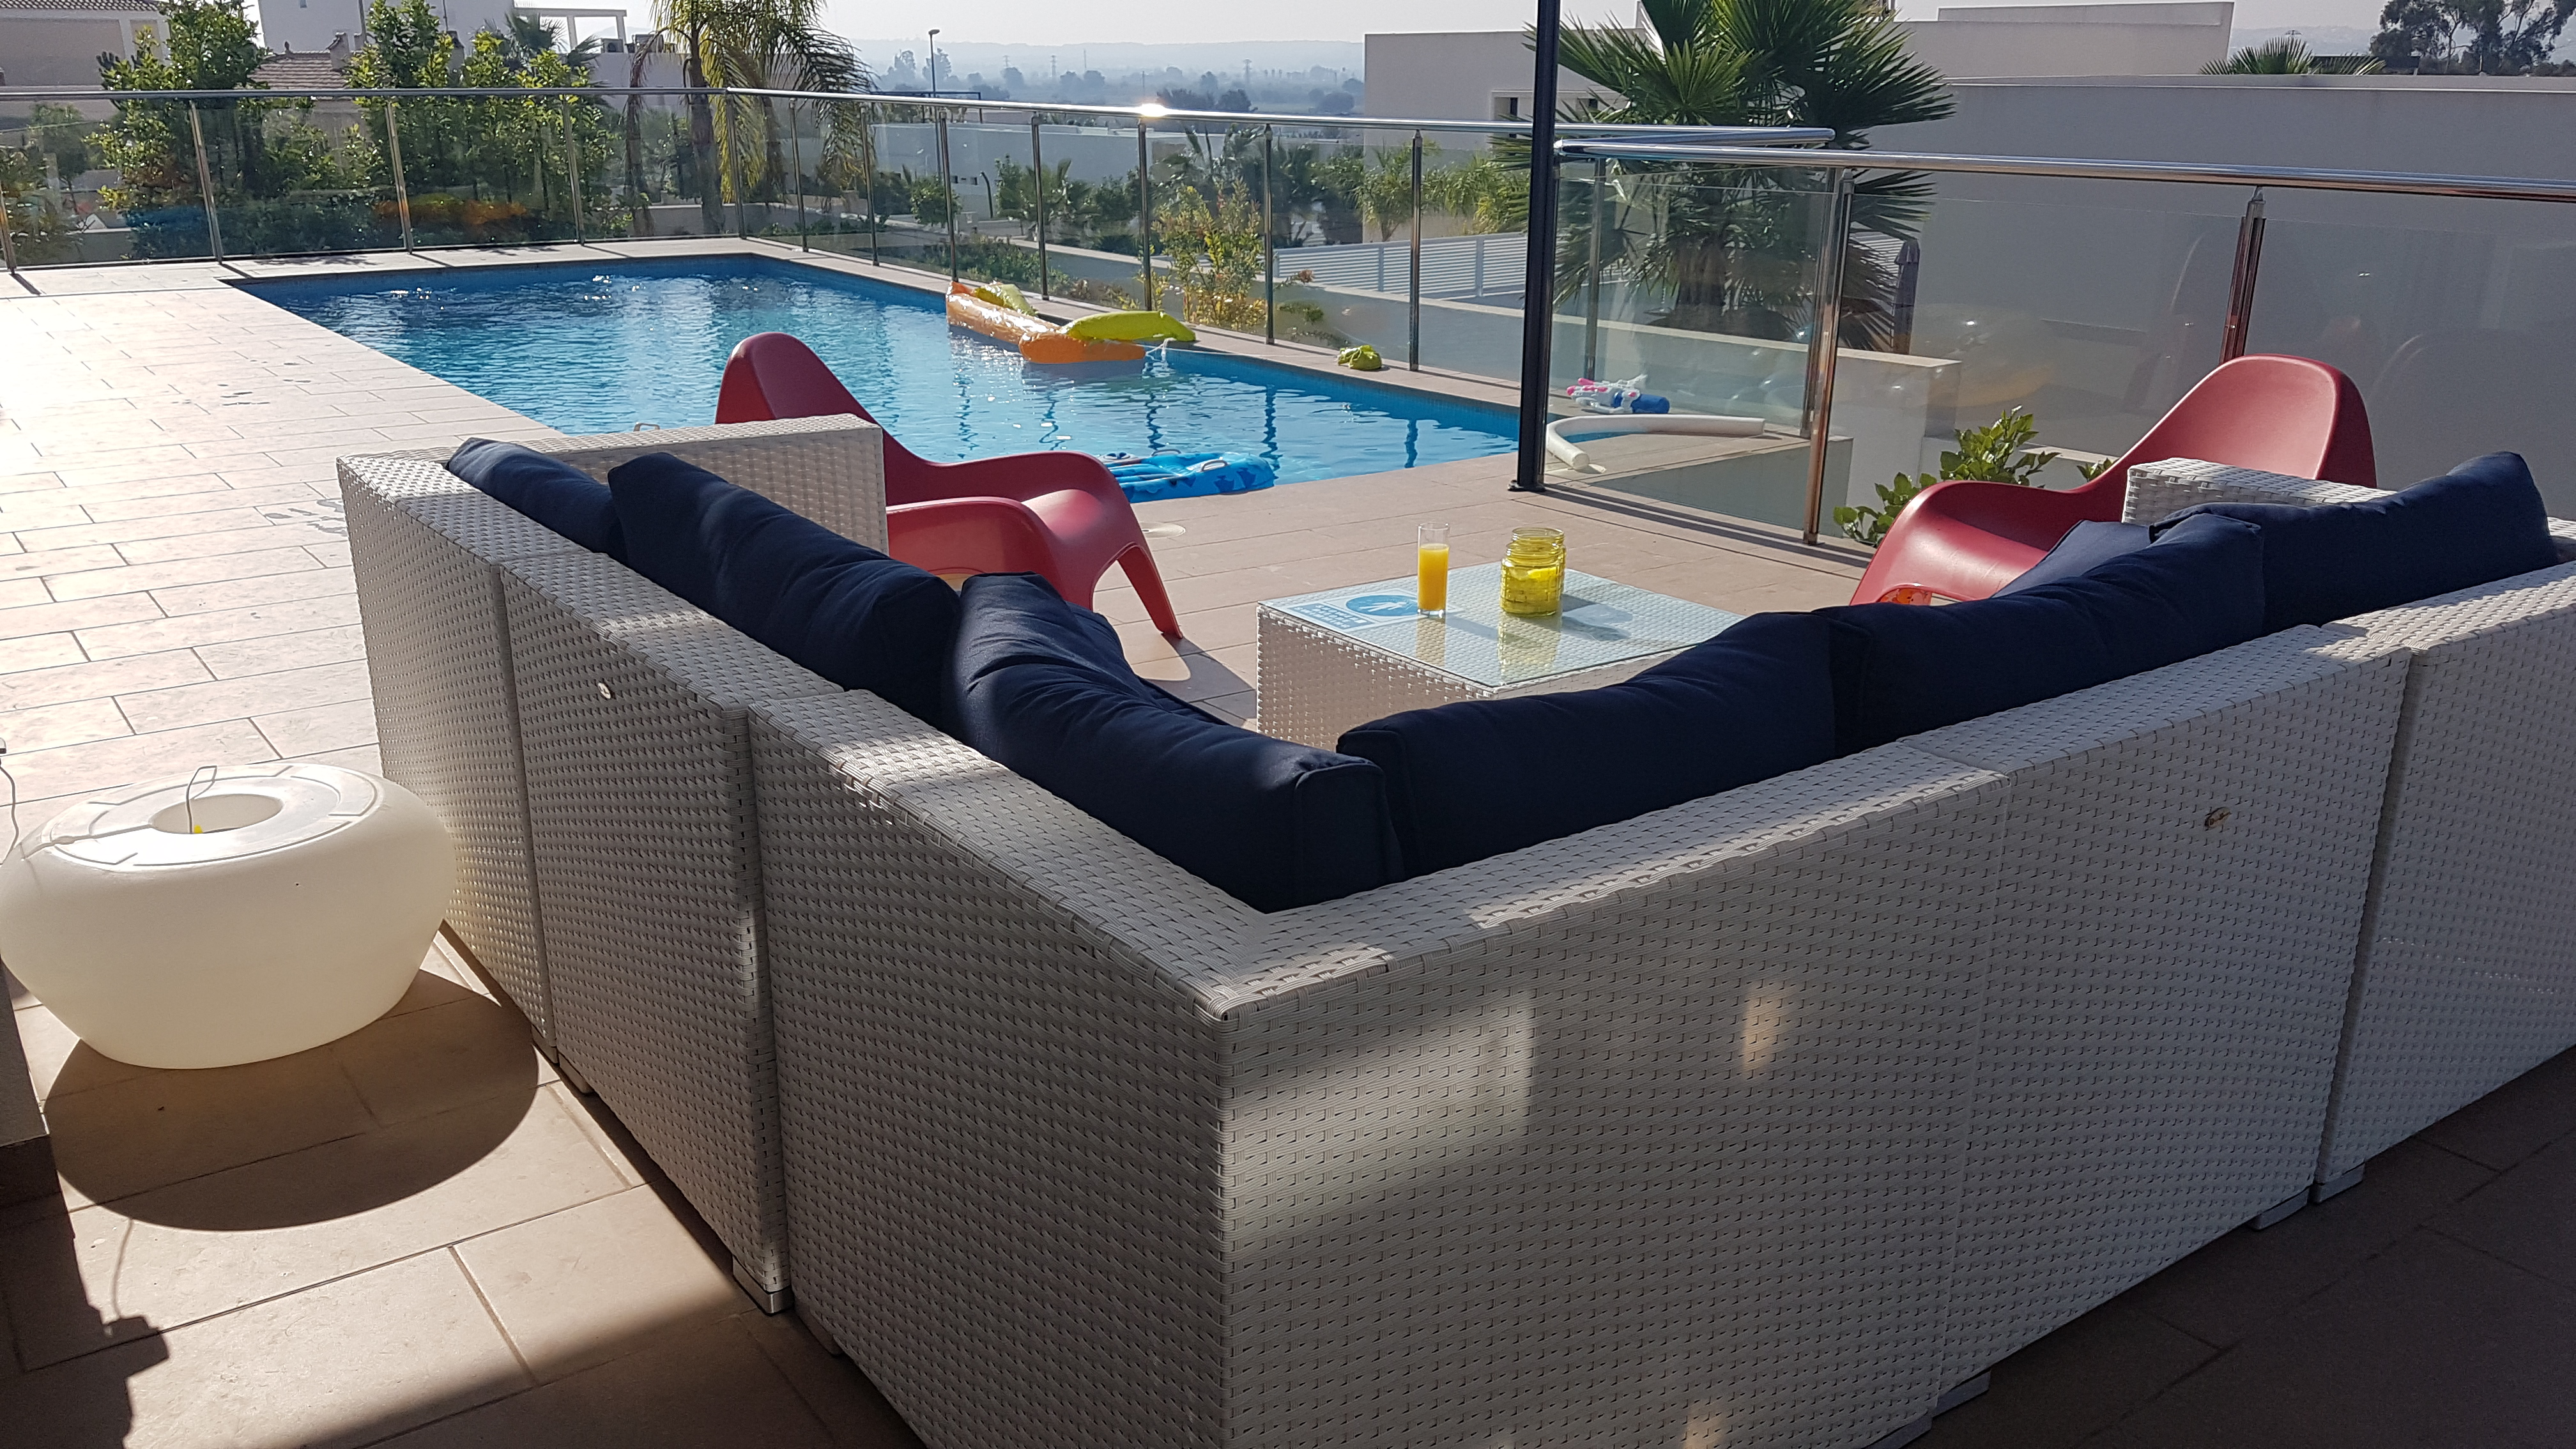 De loungehoek